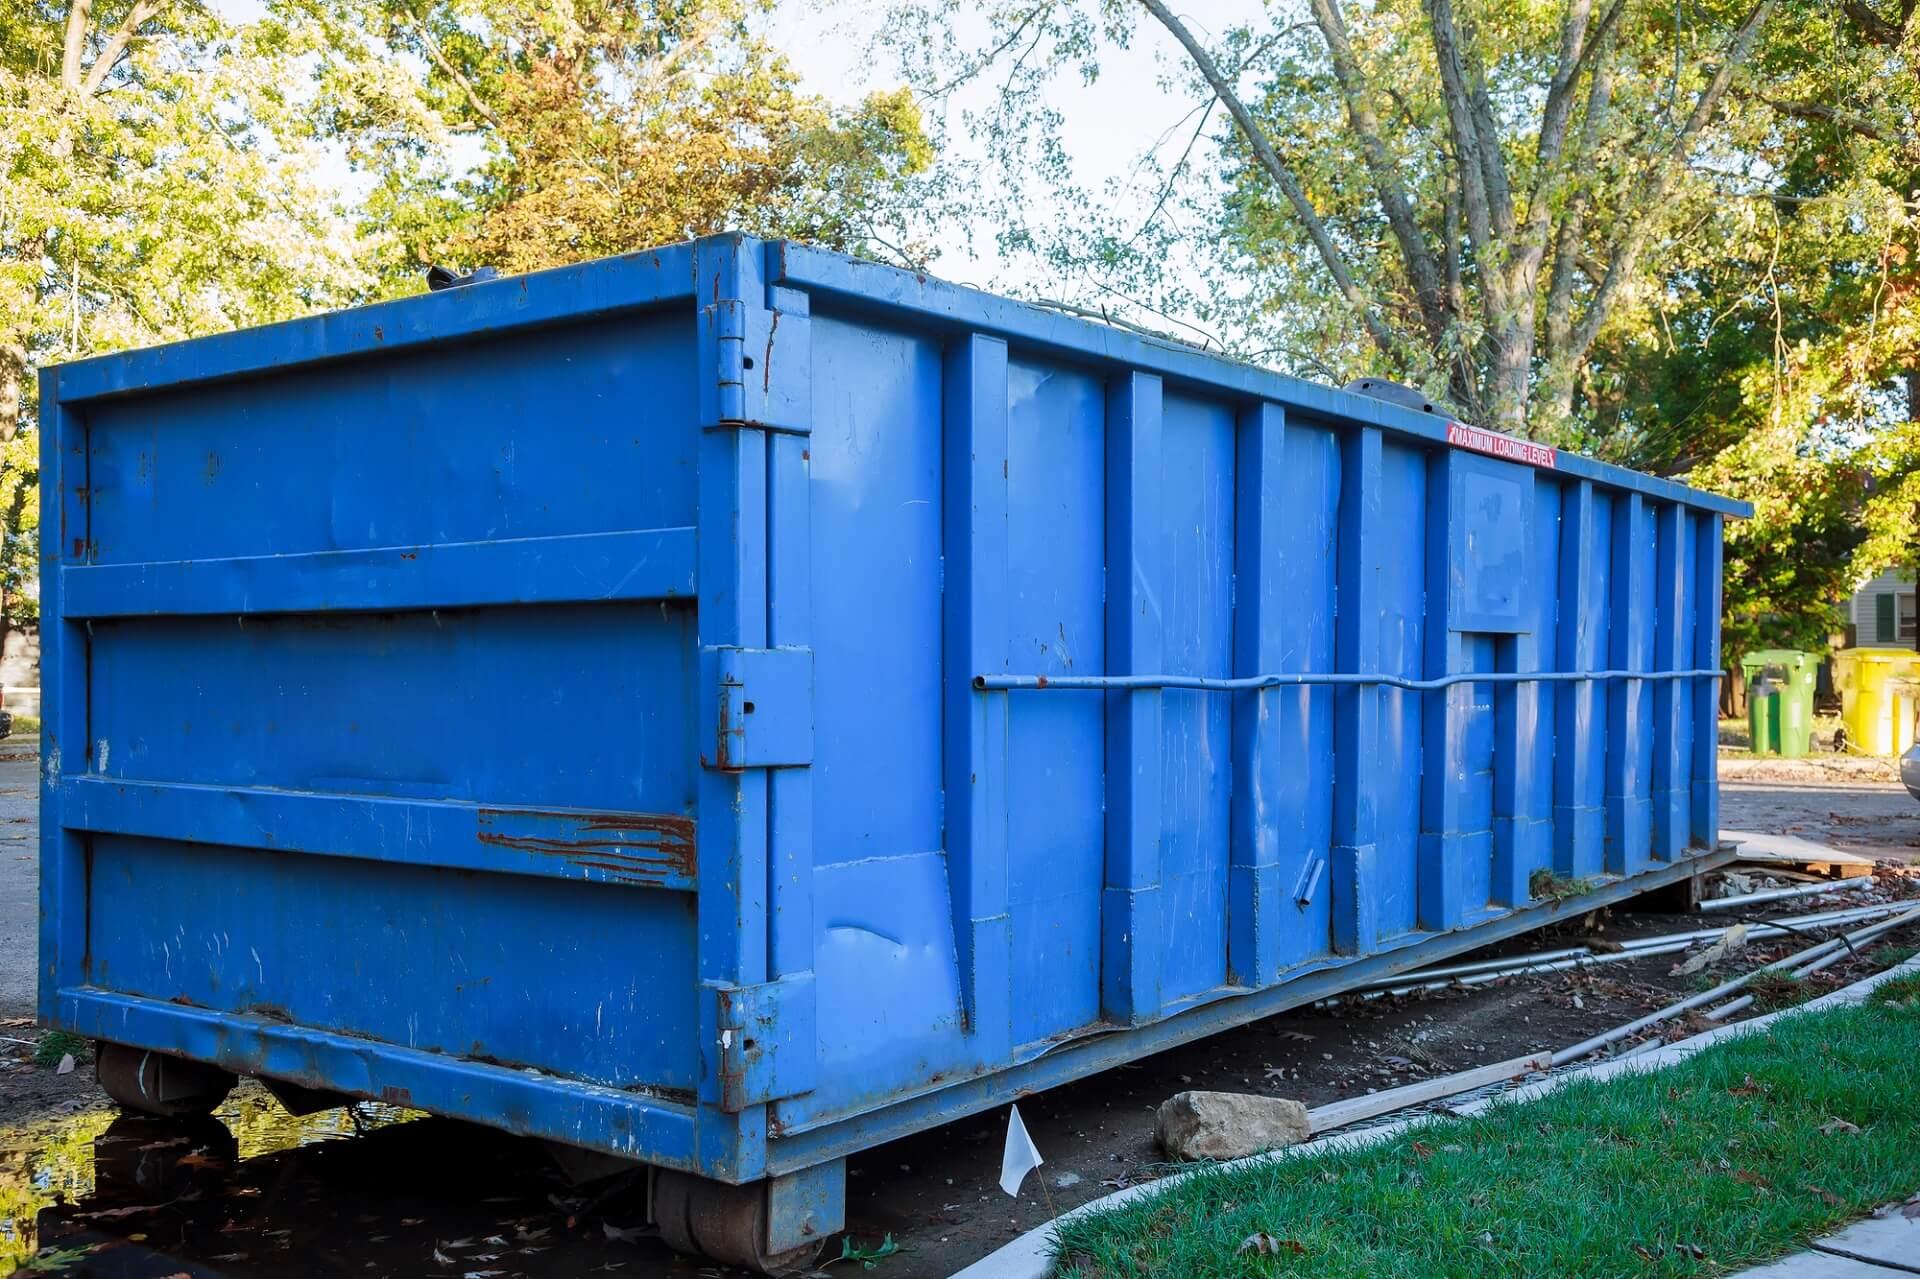 Dumpster Rental-Colorado's Premier Dumpster Rental Services